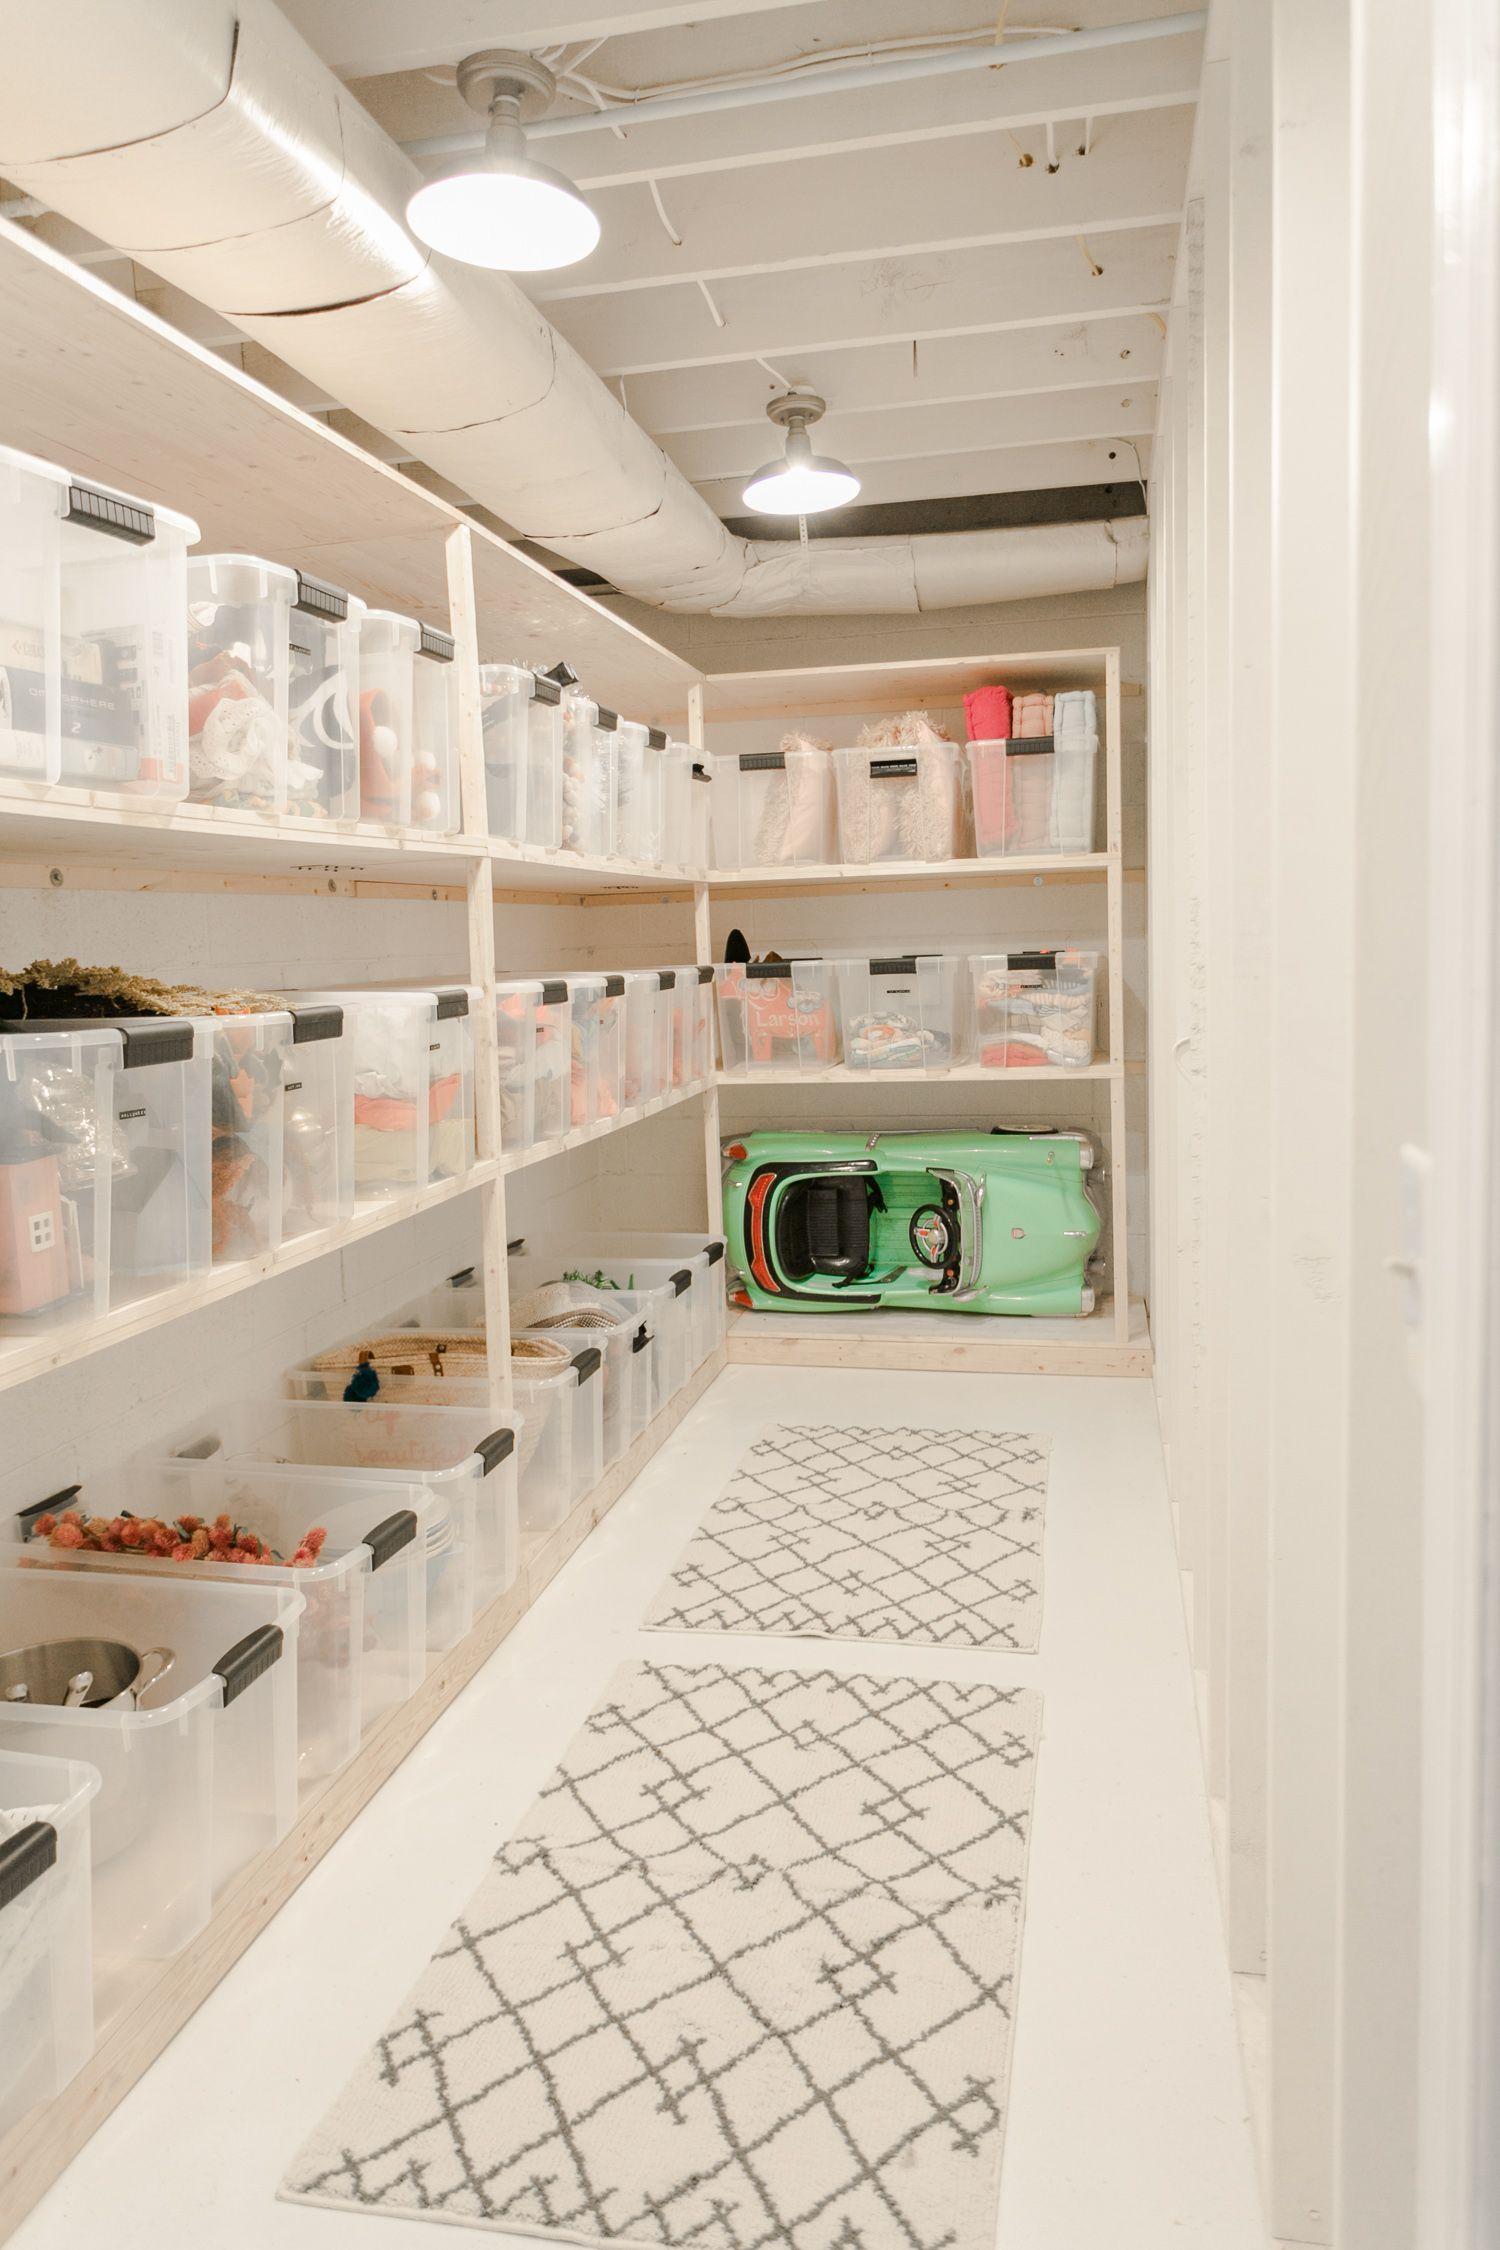 Gudang Rumah Minimalis di Ruangan Kecil